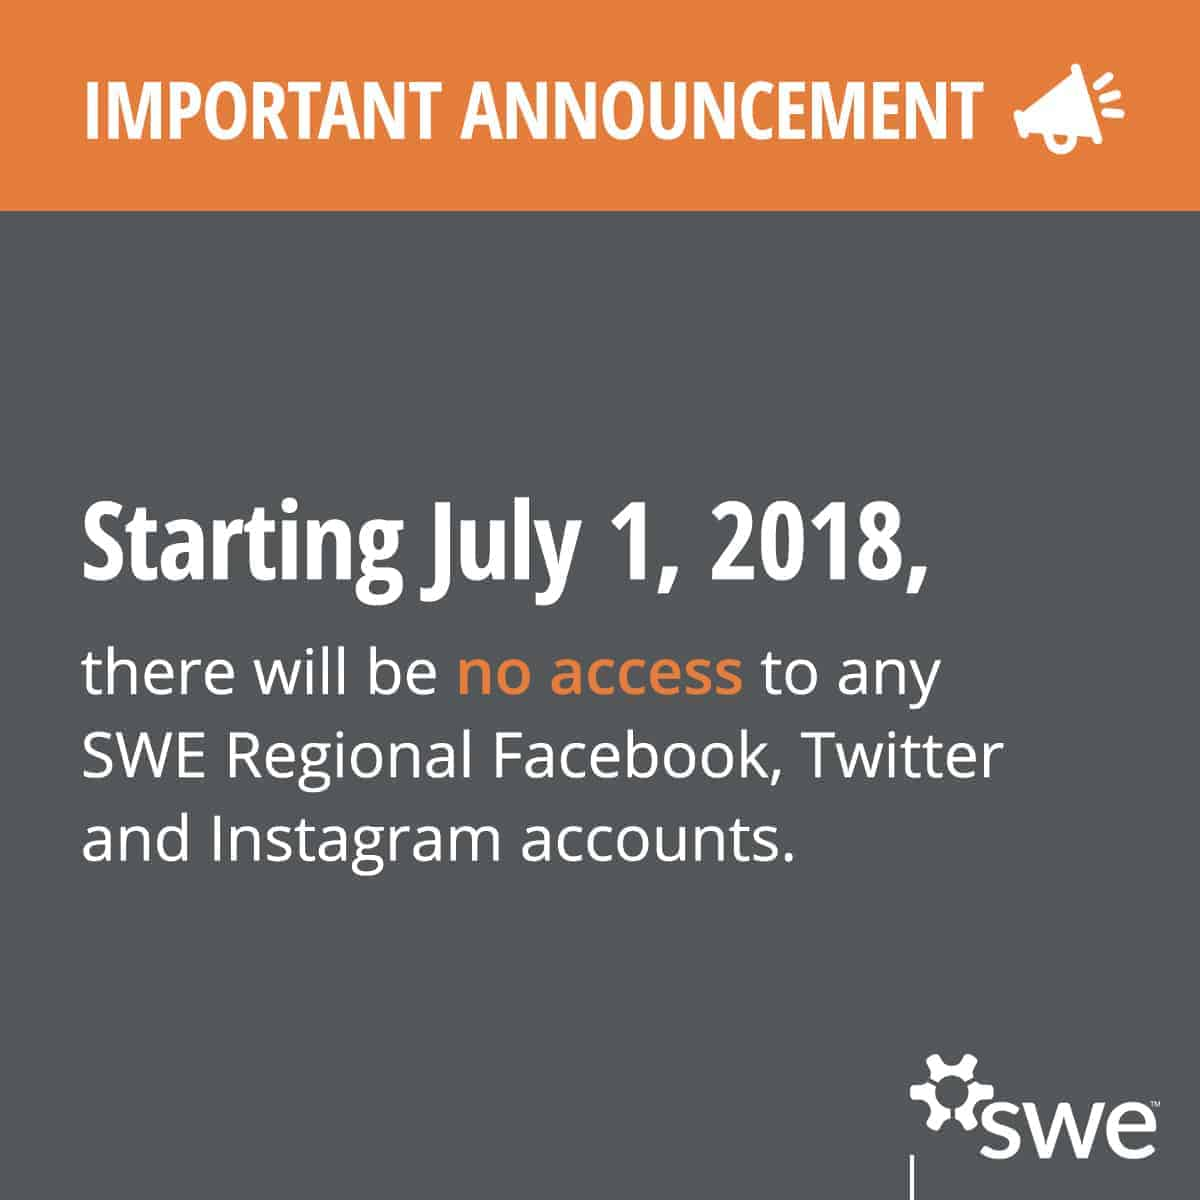 SWE Regional Social Media Accounts Closing